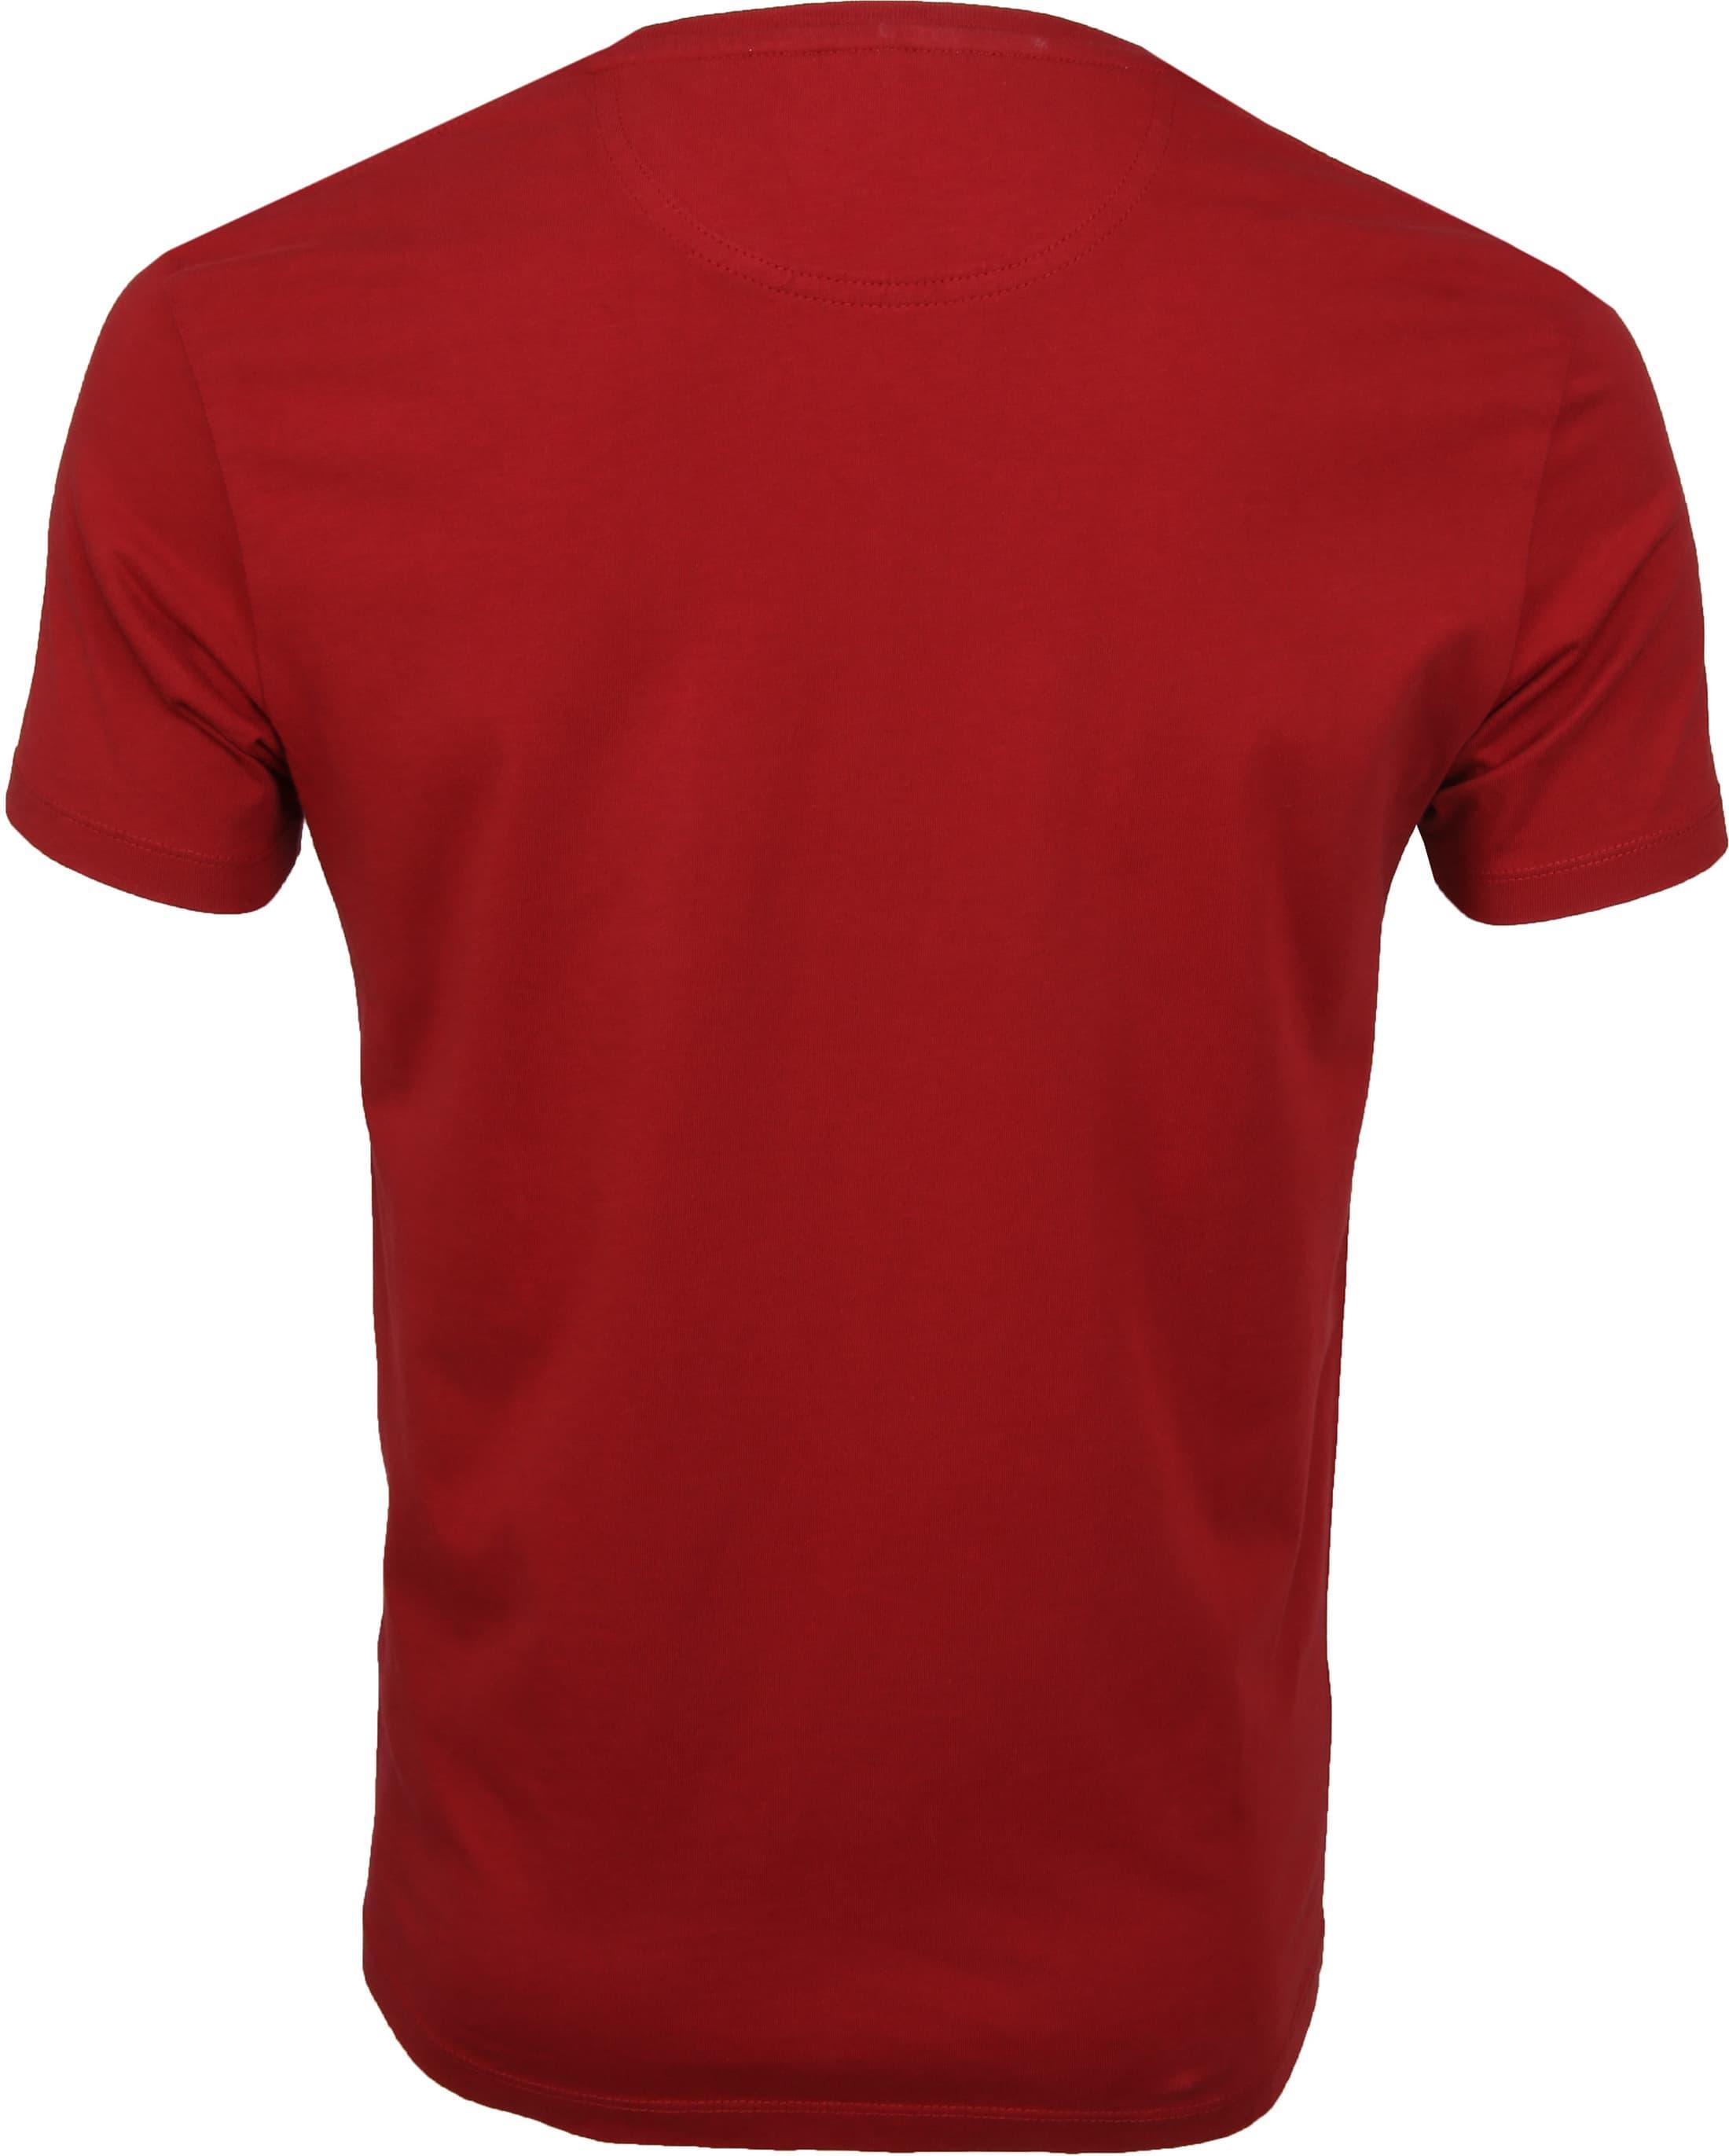 Timberland Dunstan T-shirt Red foto 2